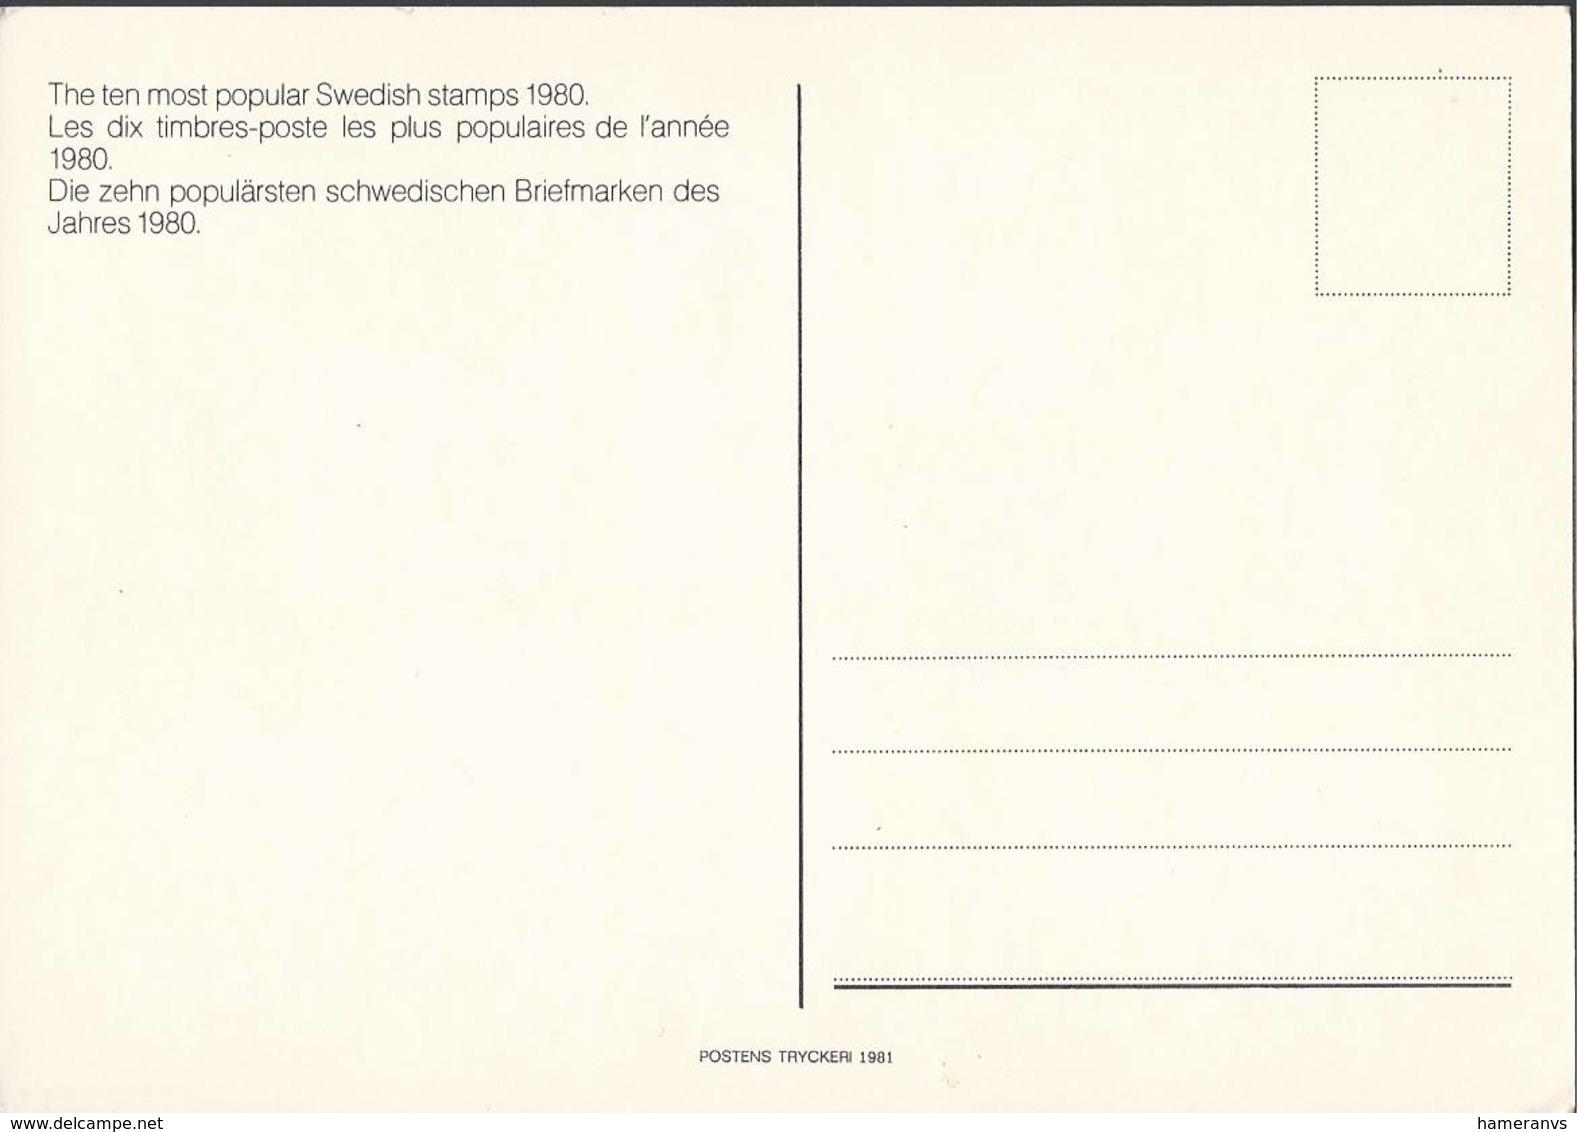 De Tio Popularaste I 1980 Ars Omrostningstavling -The Ten Most Popular Swedish Stamps 1980 -  - H2389 - Francobolli (rappresentazioni)